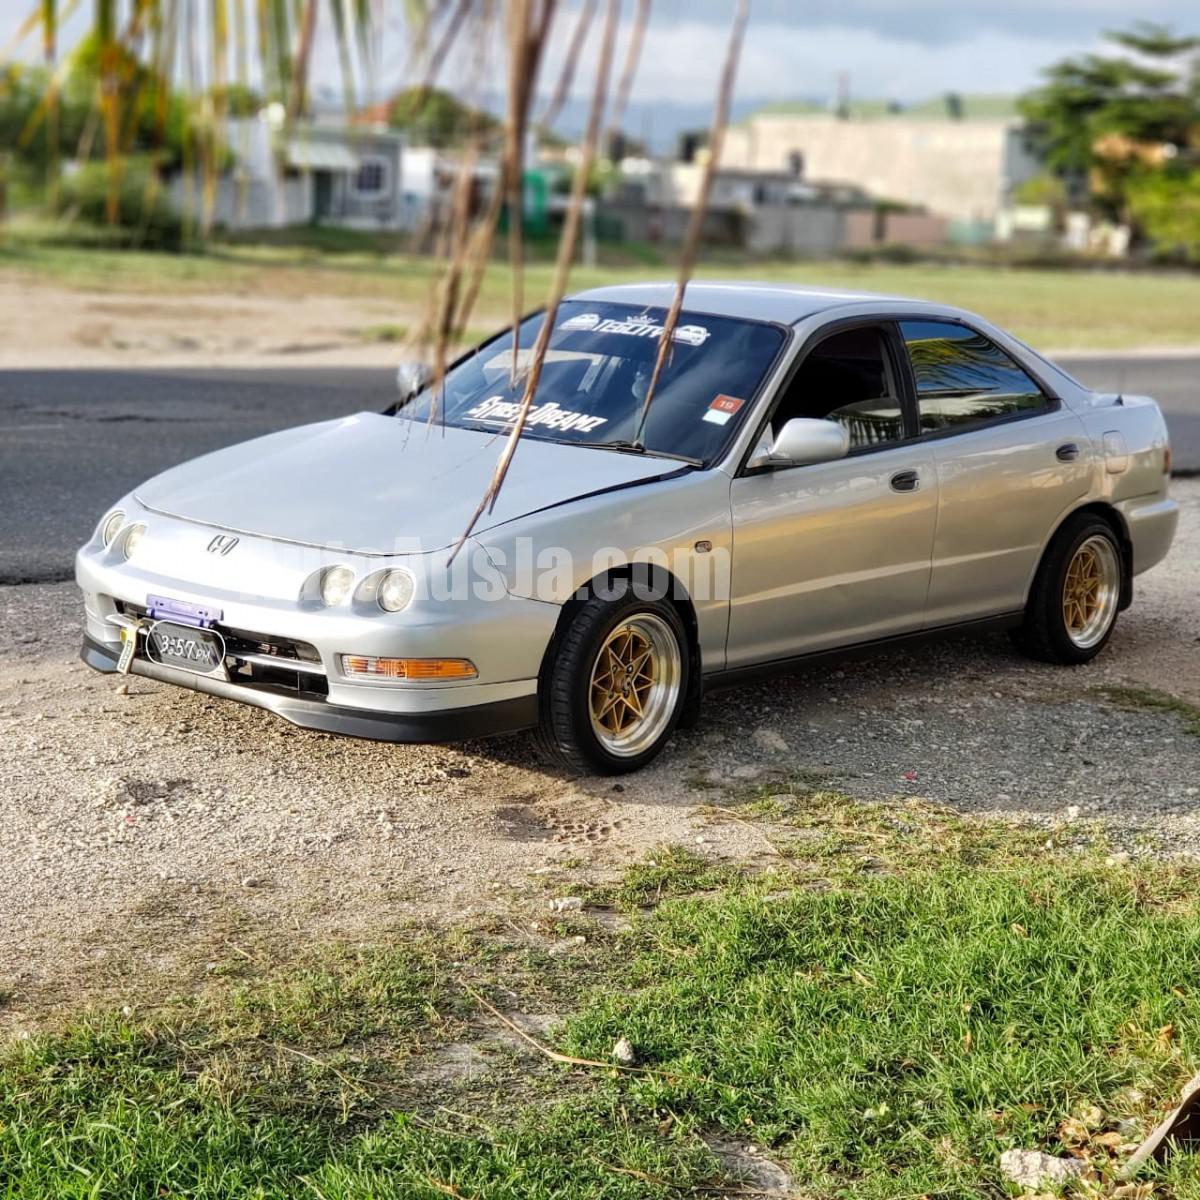 1994 Honda Integra For Sale In St. Catherine, Jamaica